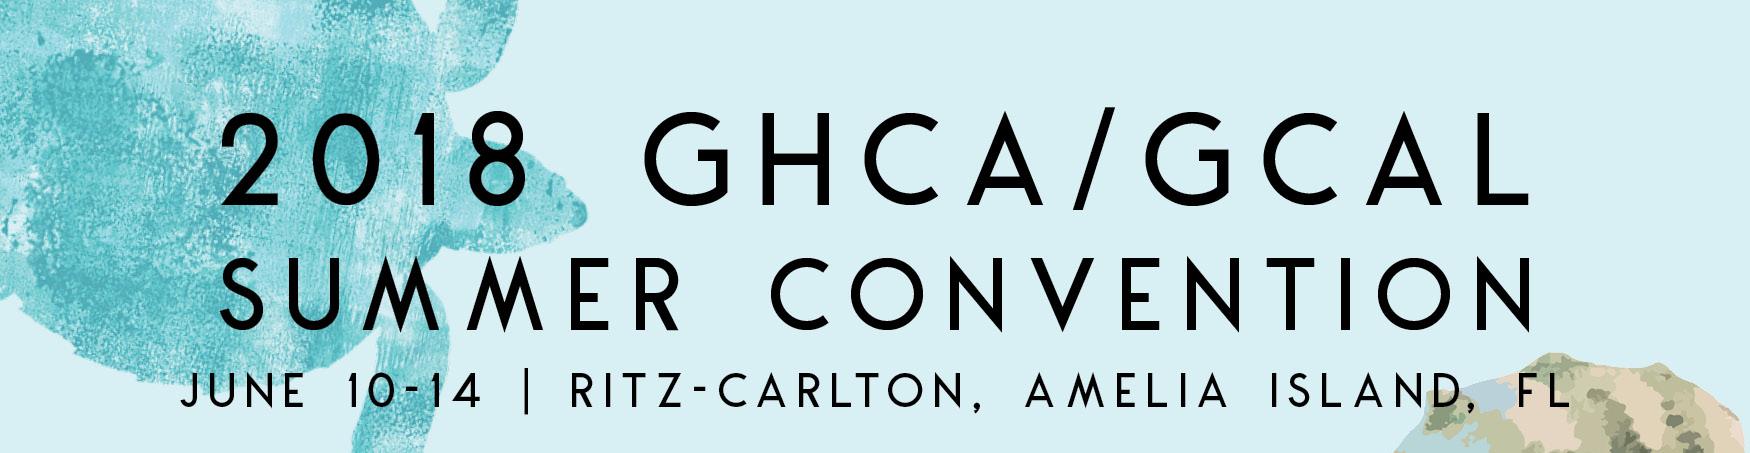 2018 GHCA/GCAL Summer Convention